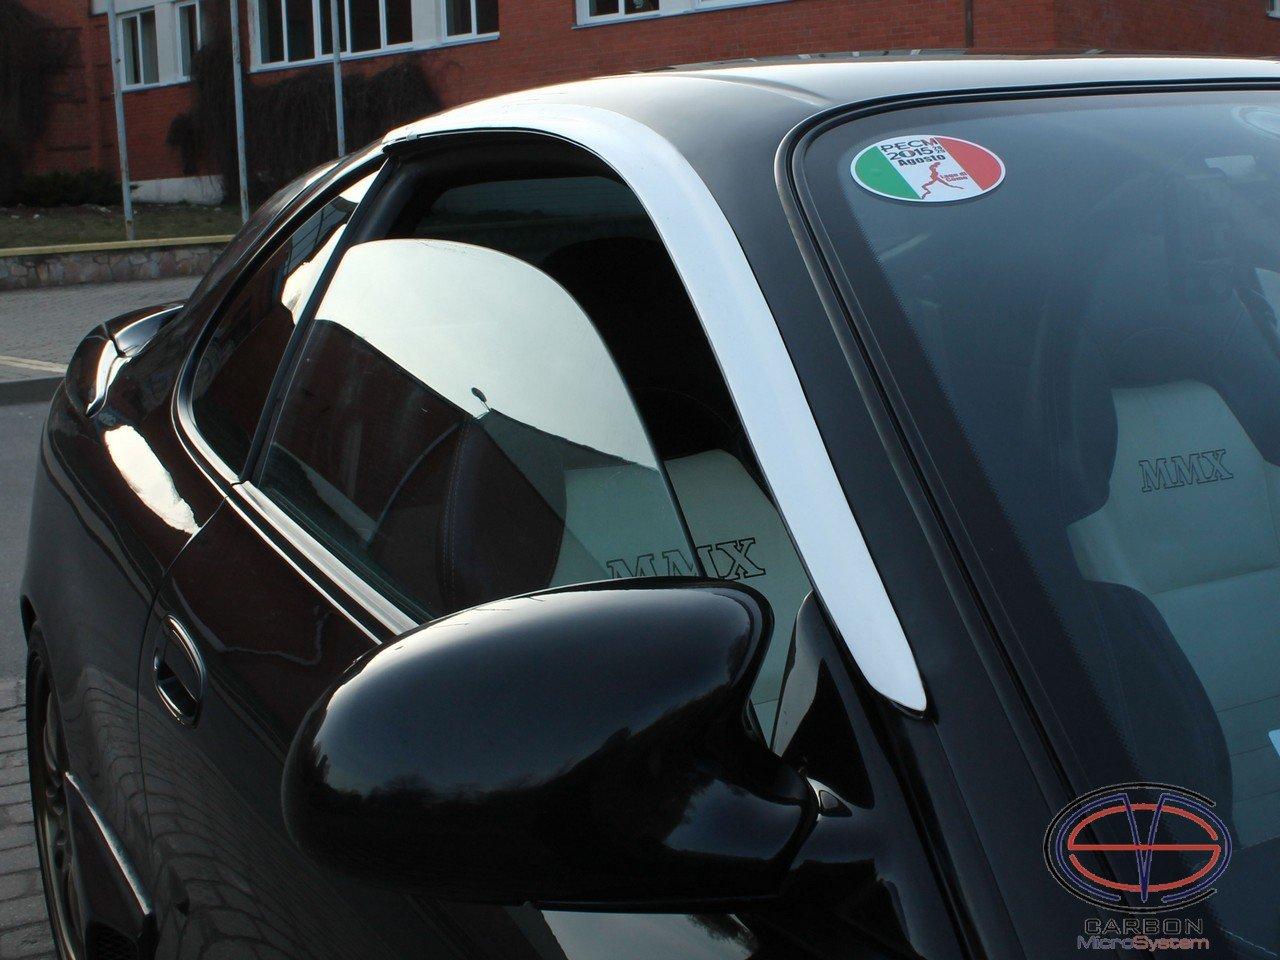 Window Wind Deflectors from FiberGlass for TOYOTA Celica ST 182, ST 183, ST 185 GT4